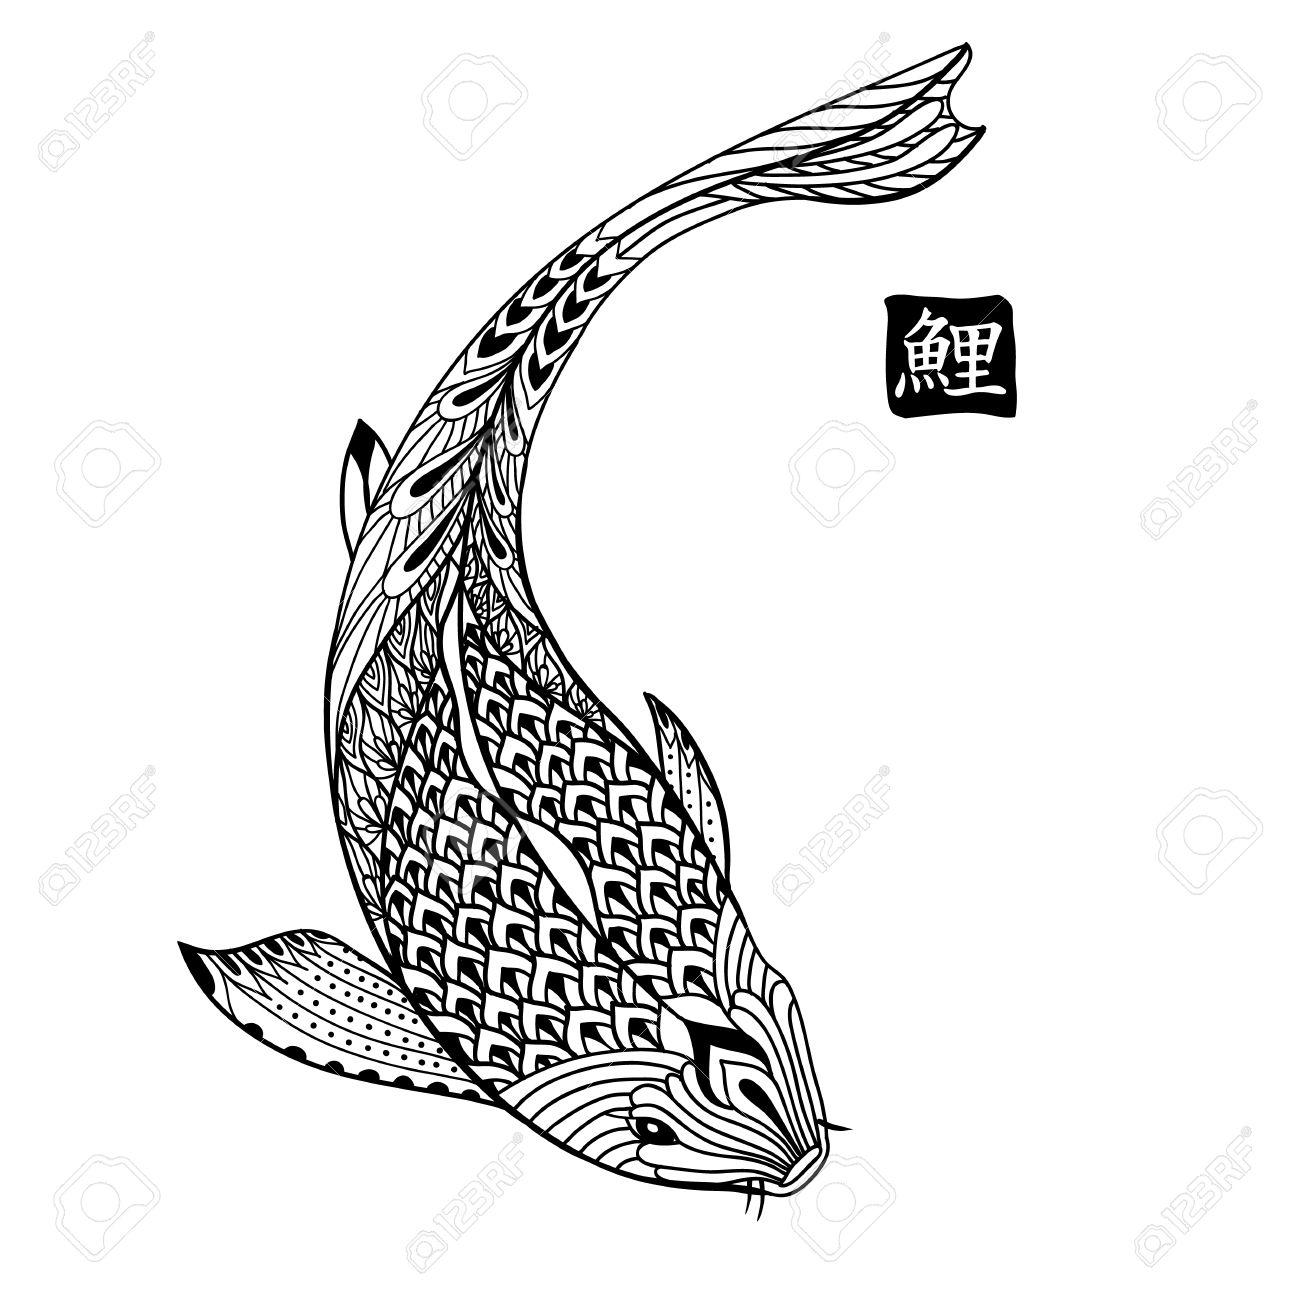 1300x1300 Hand Drawn Koi Fish. Japanese Carp Line Drawing For Coloring Book